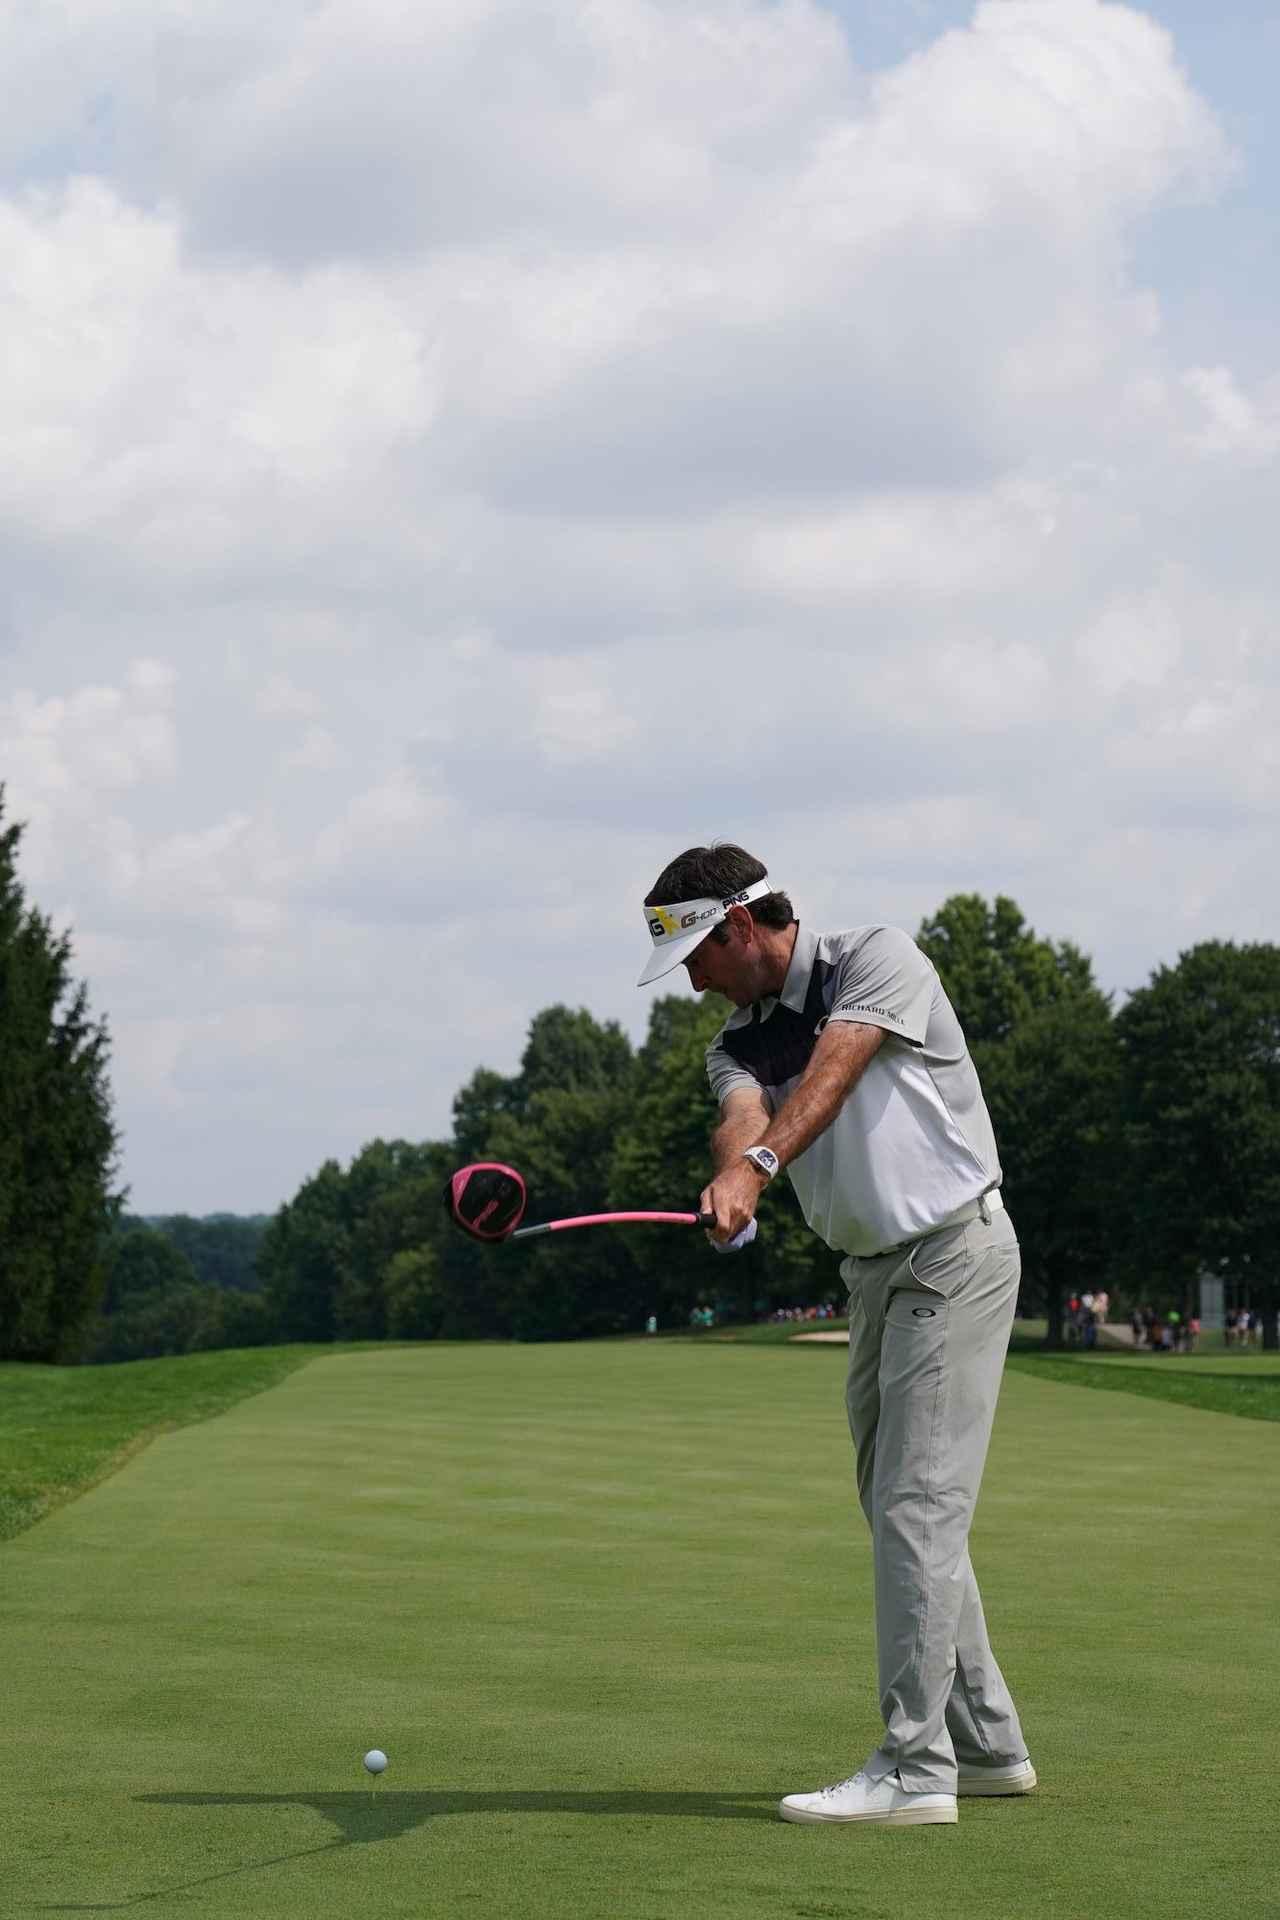 Images : 3番目の画像 - 強烈! バッバ・ワトソンのドライバーショット - みんなのゴルフダイジェスト